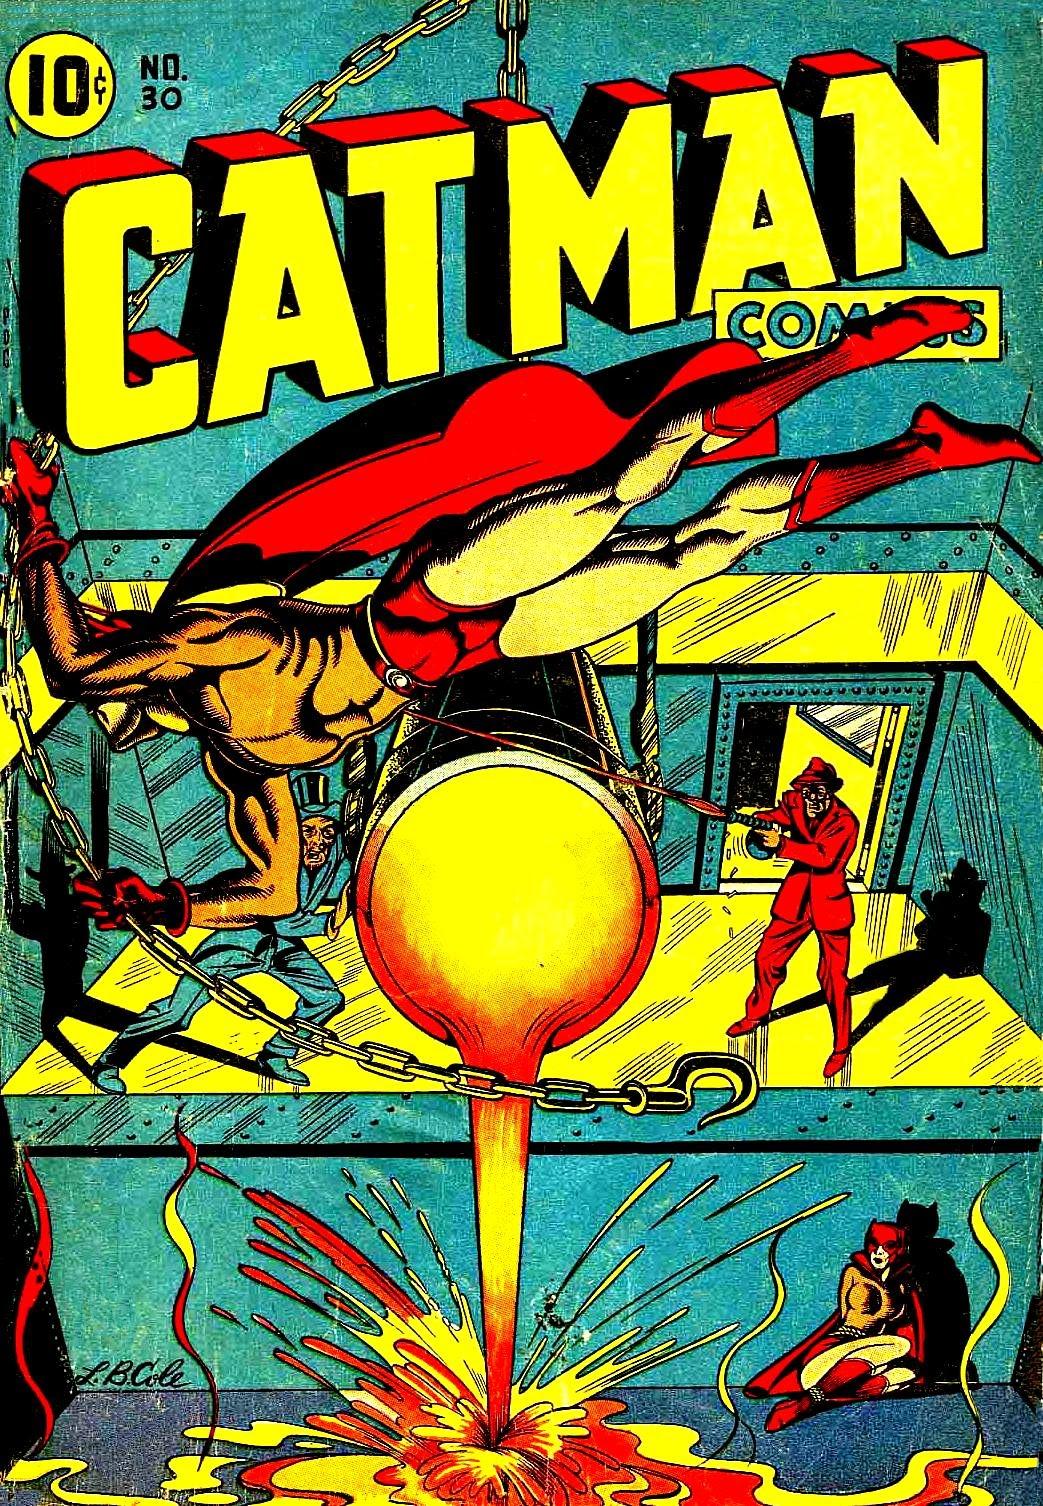 Cat-Man Comics 30 Page 1